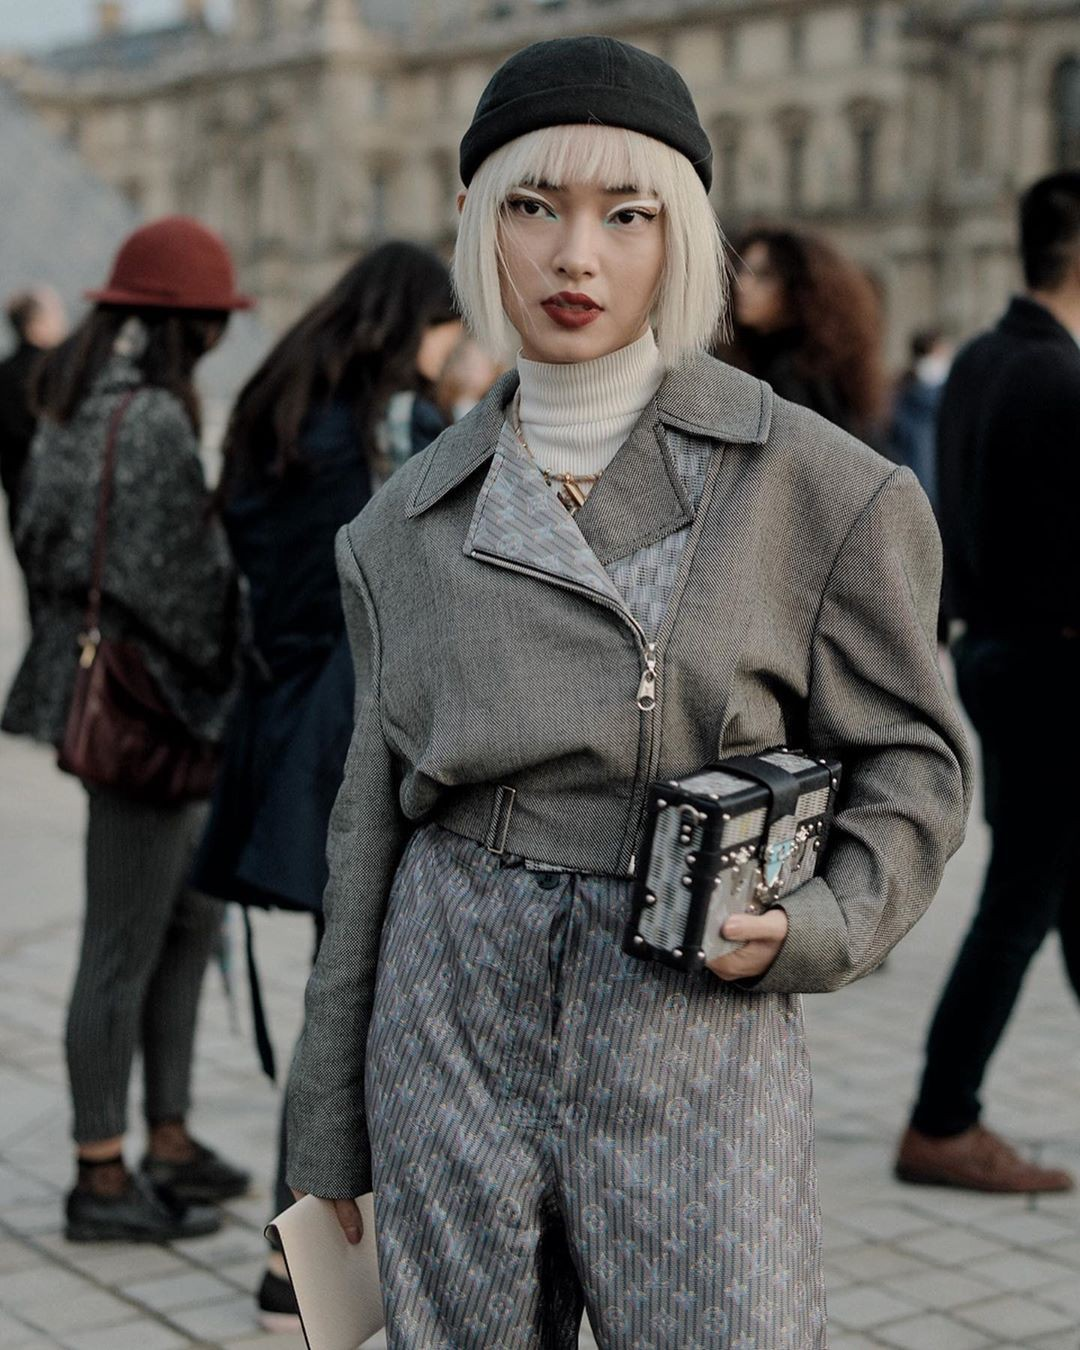 Châu Bùi show Louis Vuitton